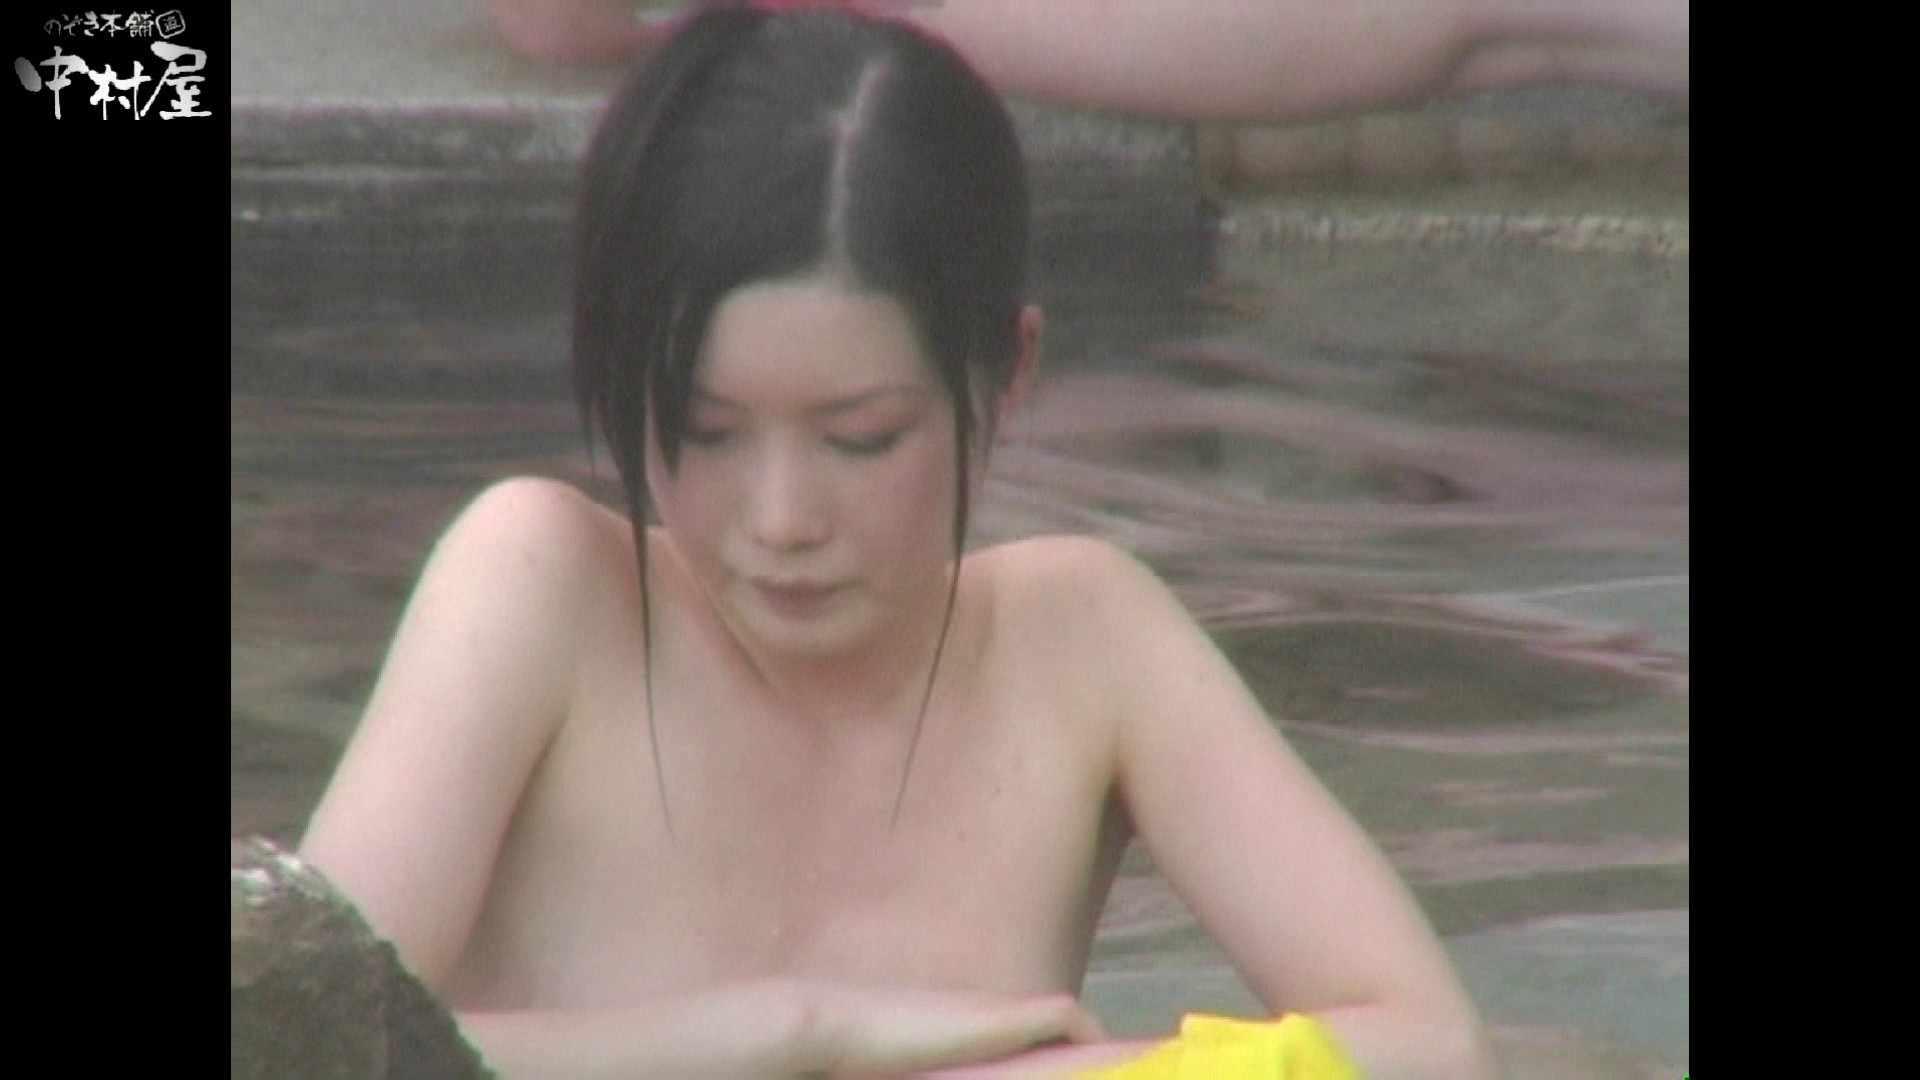 Aquaな露天風呂Vol.940 OLセックス  98画像 81